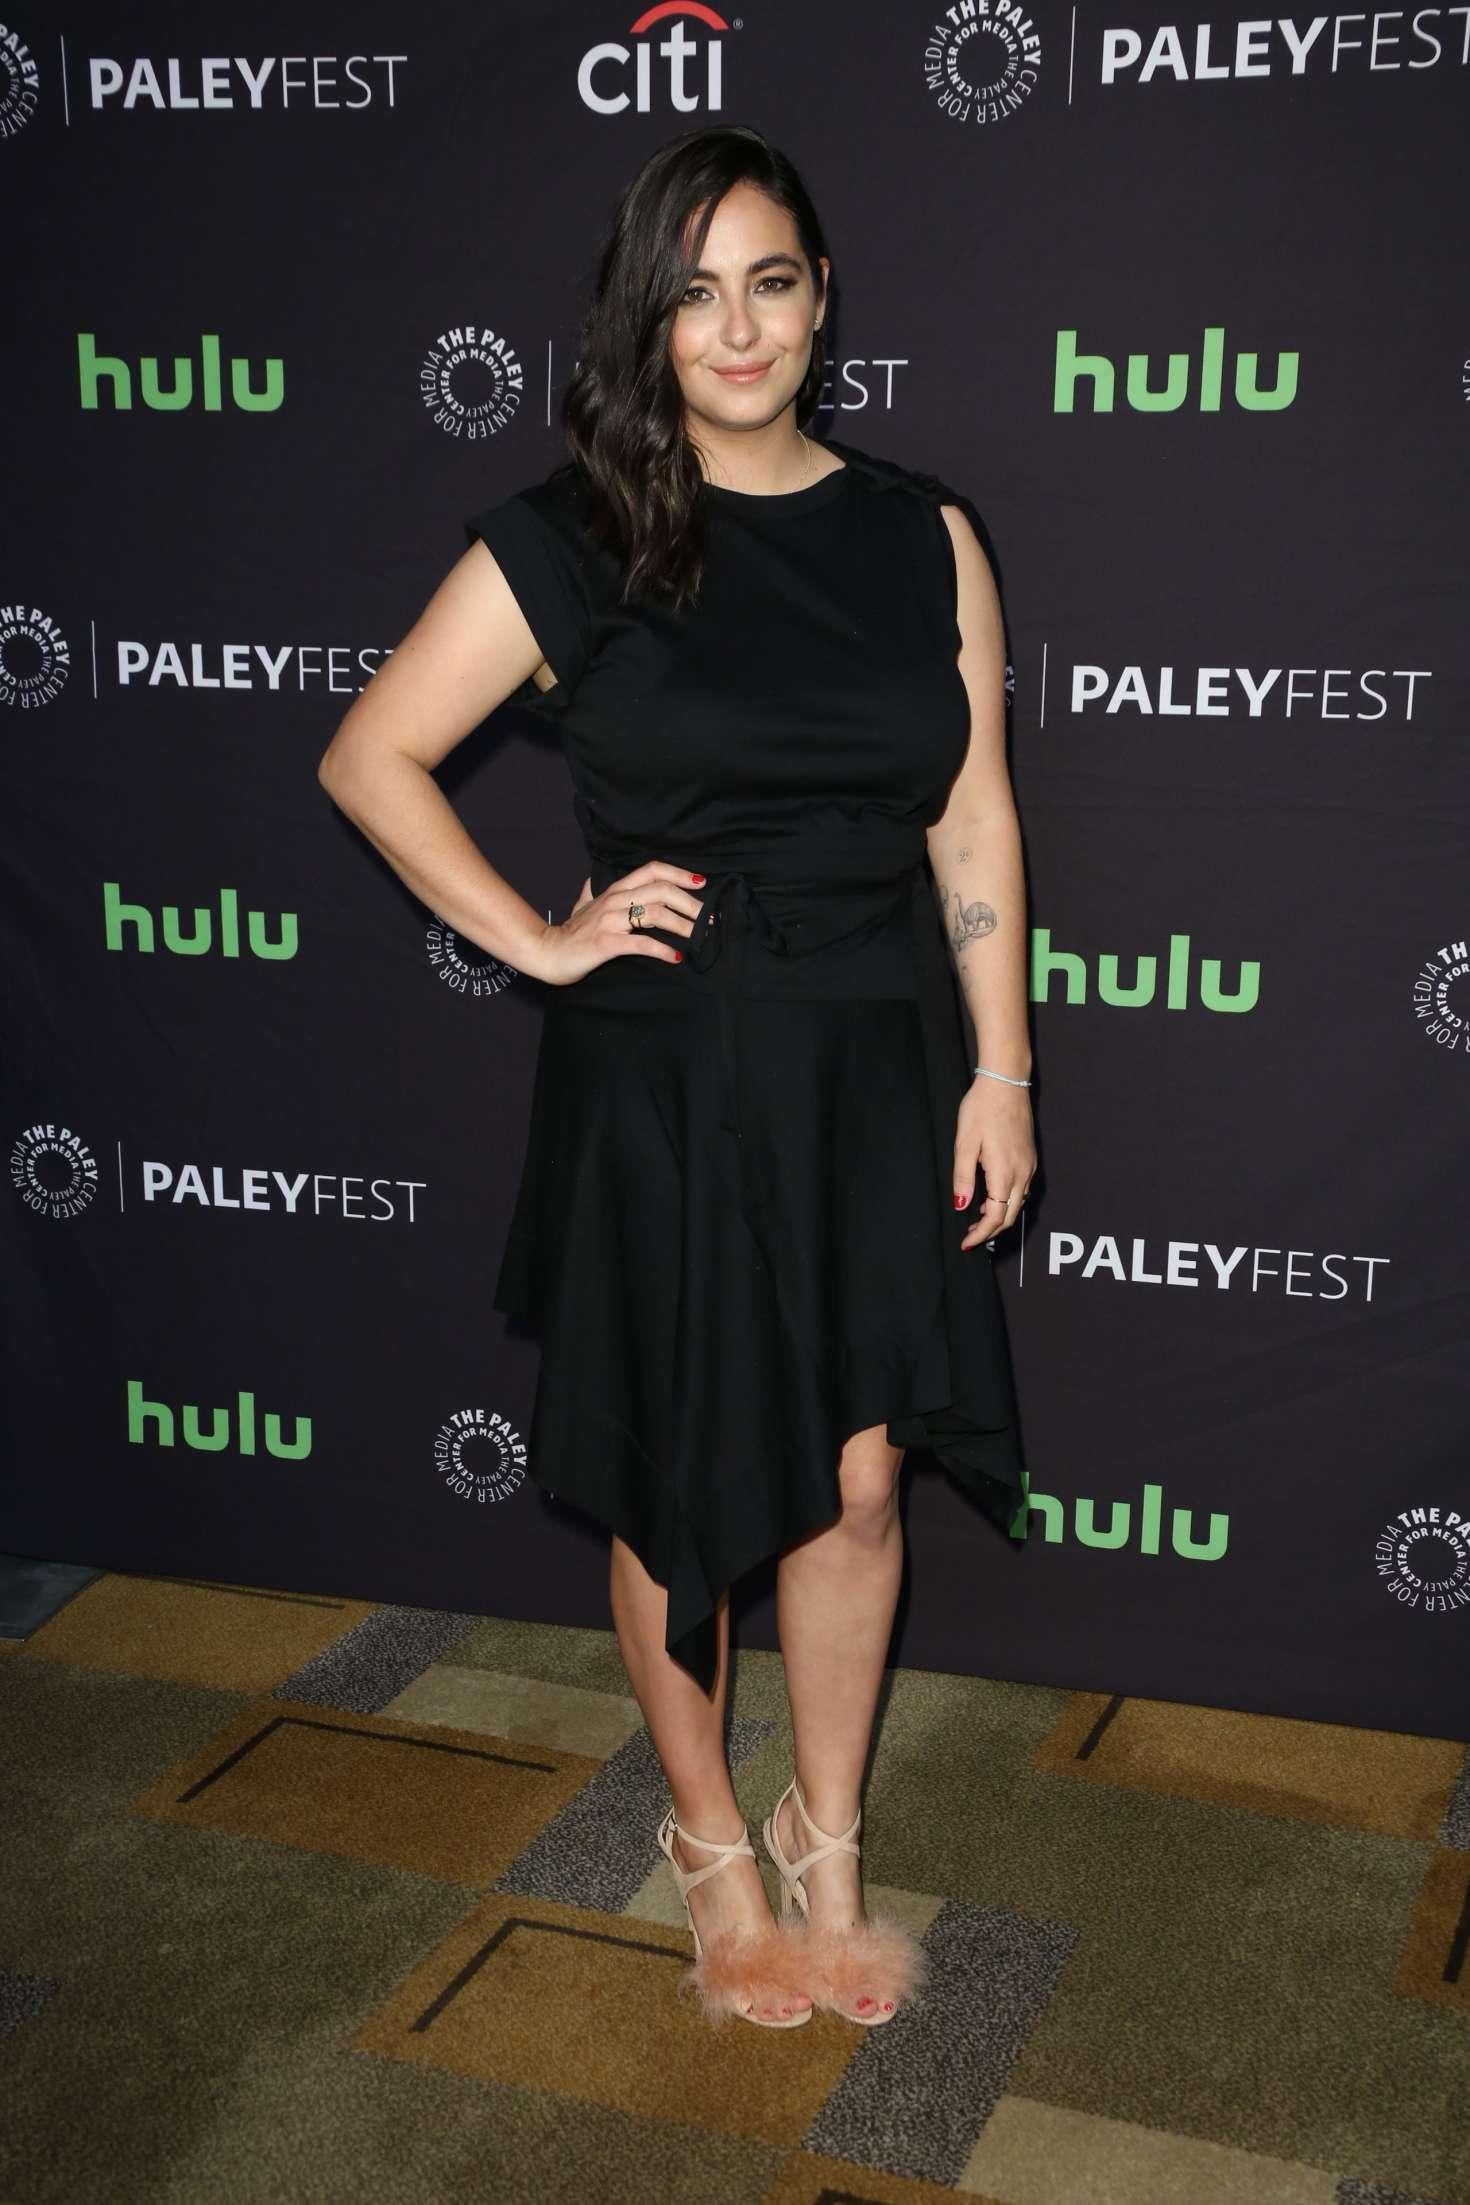 Alanna Masterson - 'The Walking Dead' TV Series Presentation for Paleyfest in LA